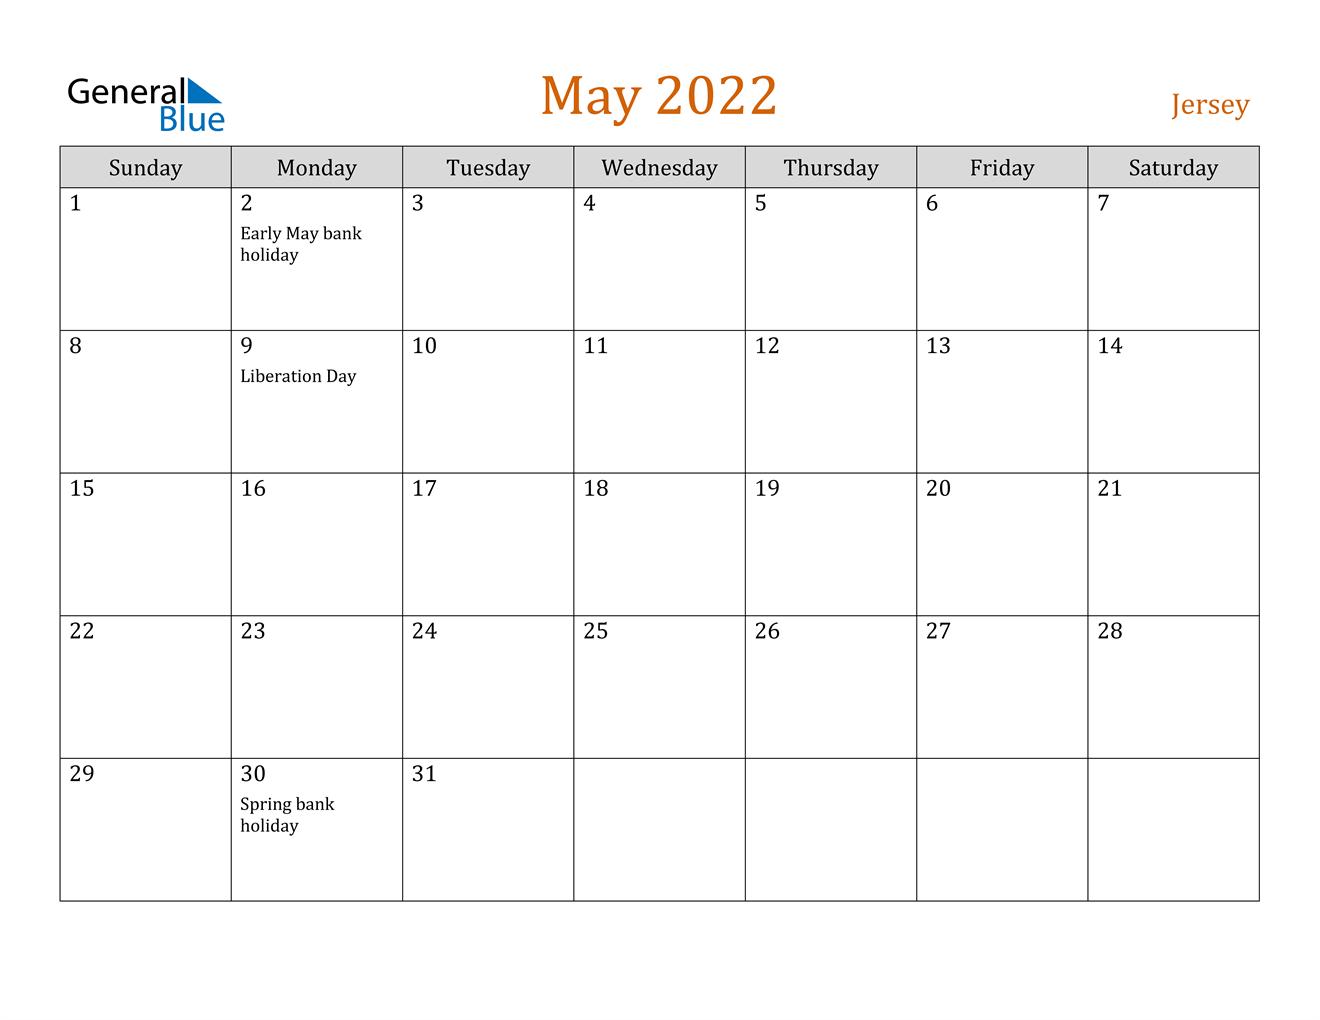 May 2022 Calendar Pdf.Jersey May 2022 Calendar With Holidays